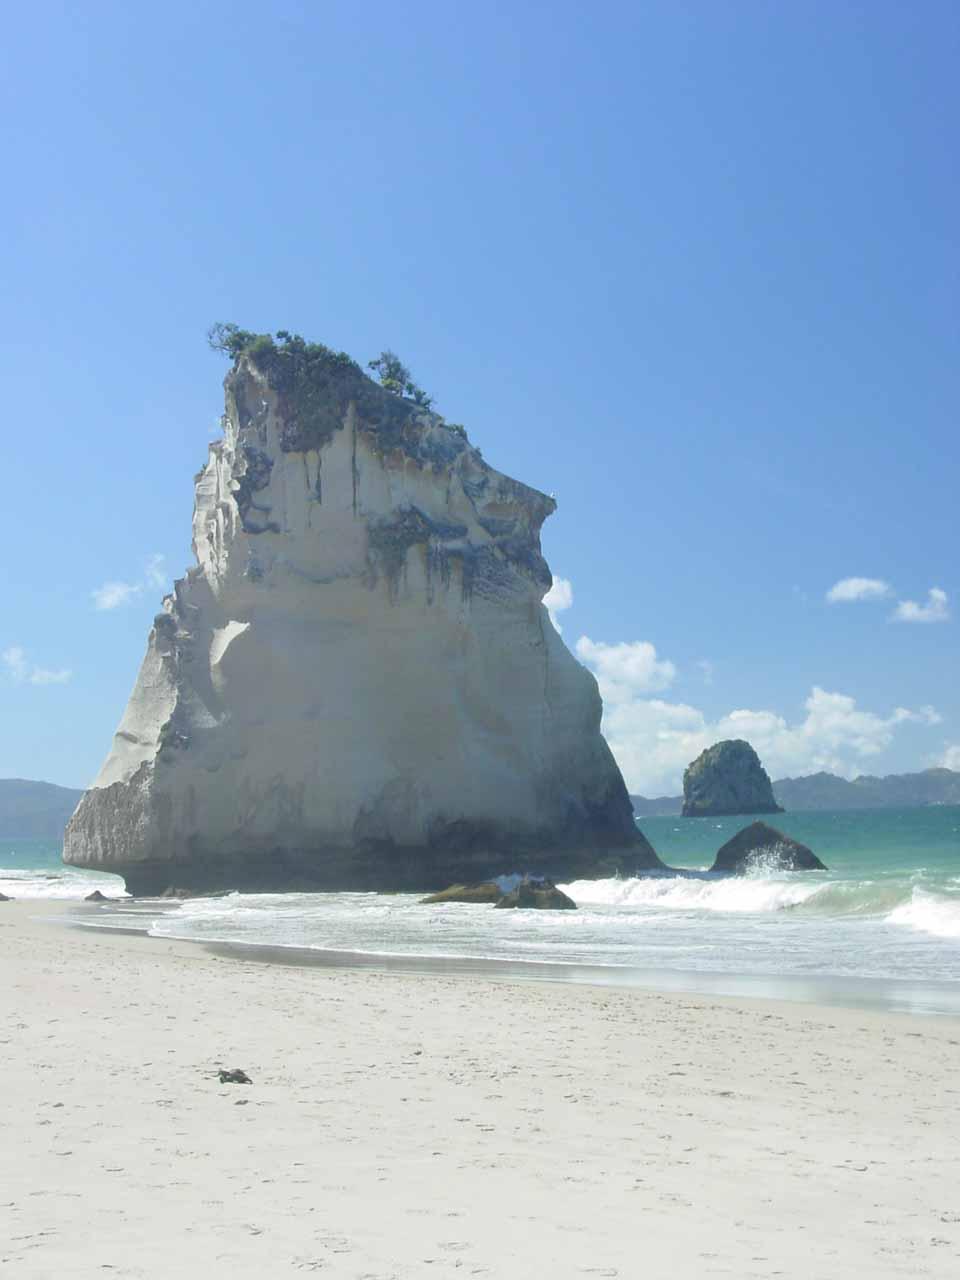 Closer look at the impressive Hoho Rock